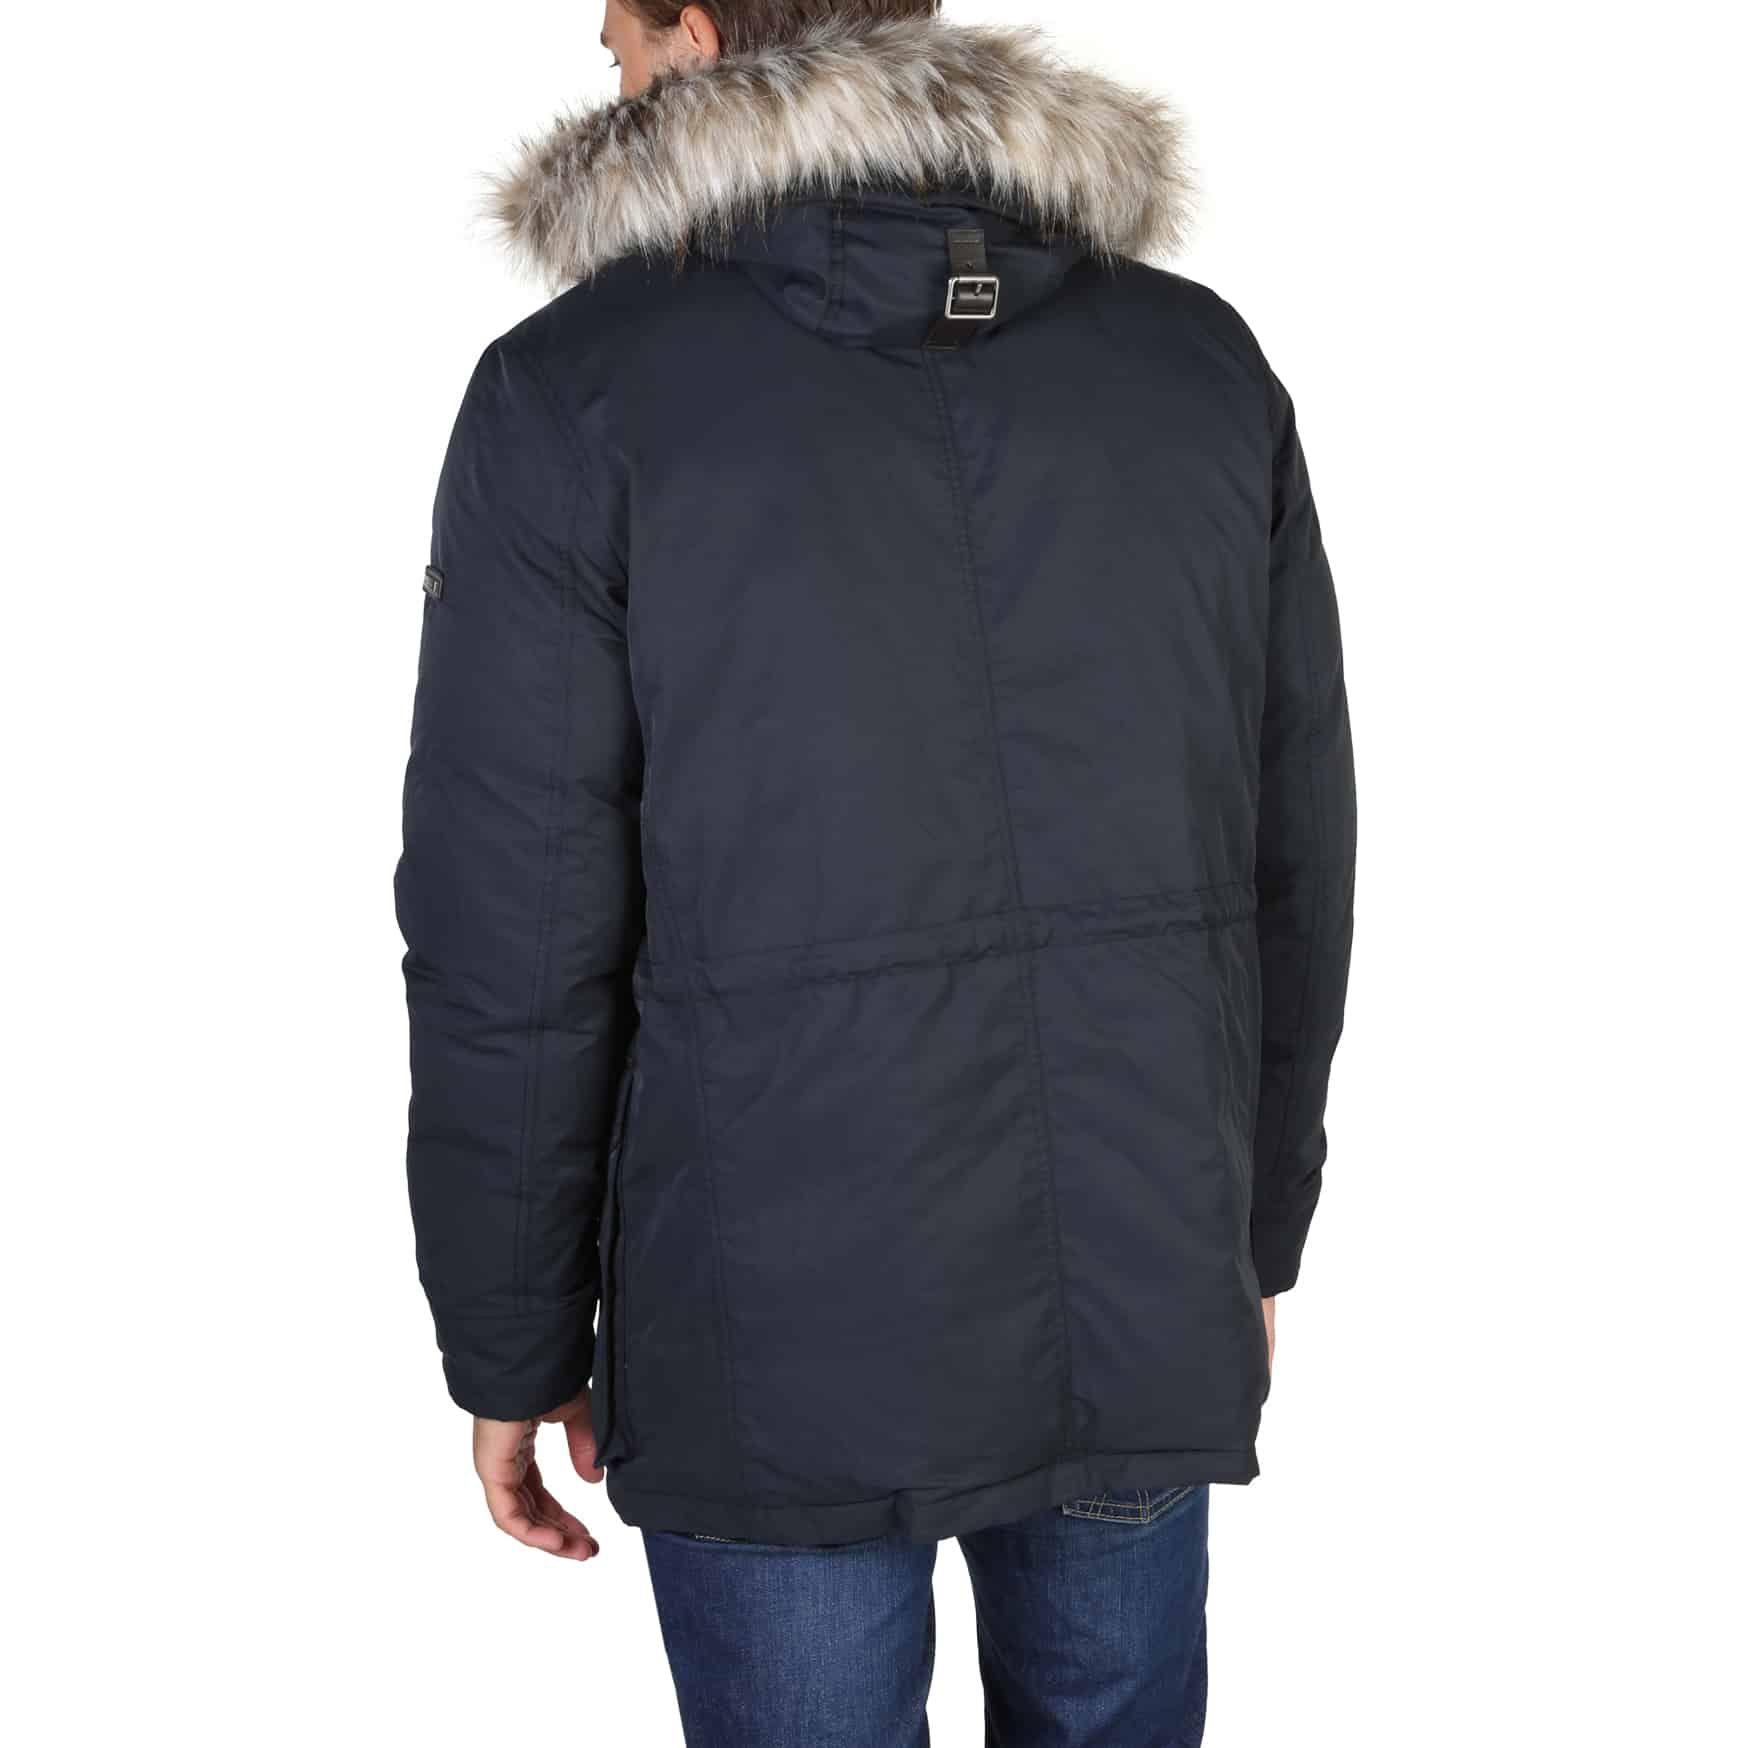 Clothing Hackett – HM402494